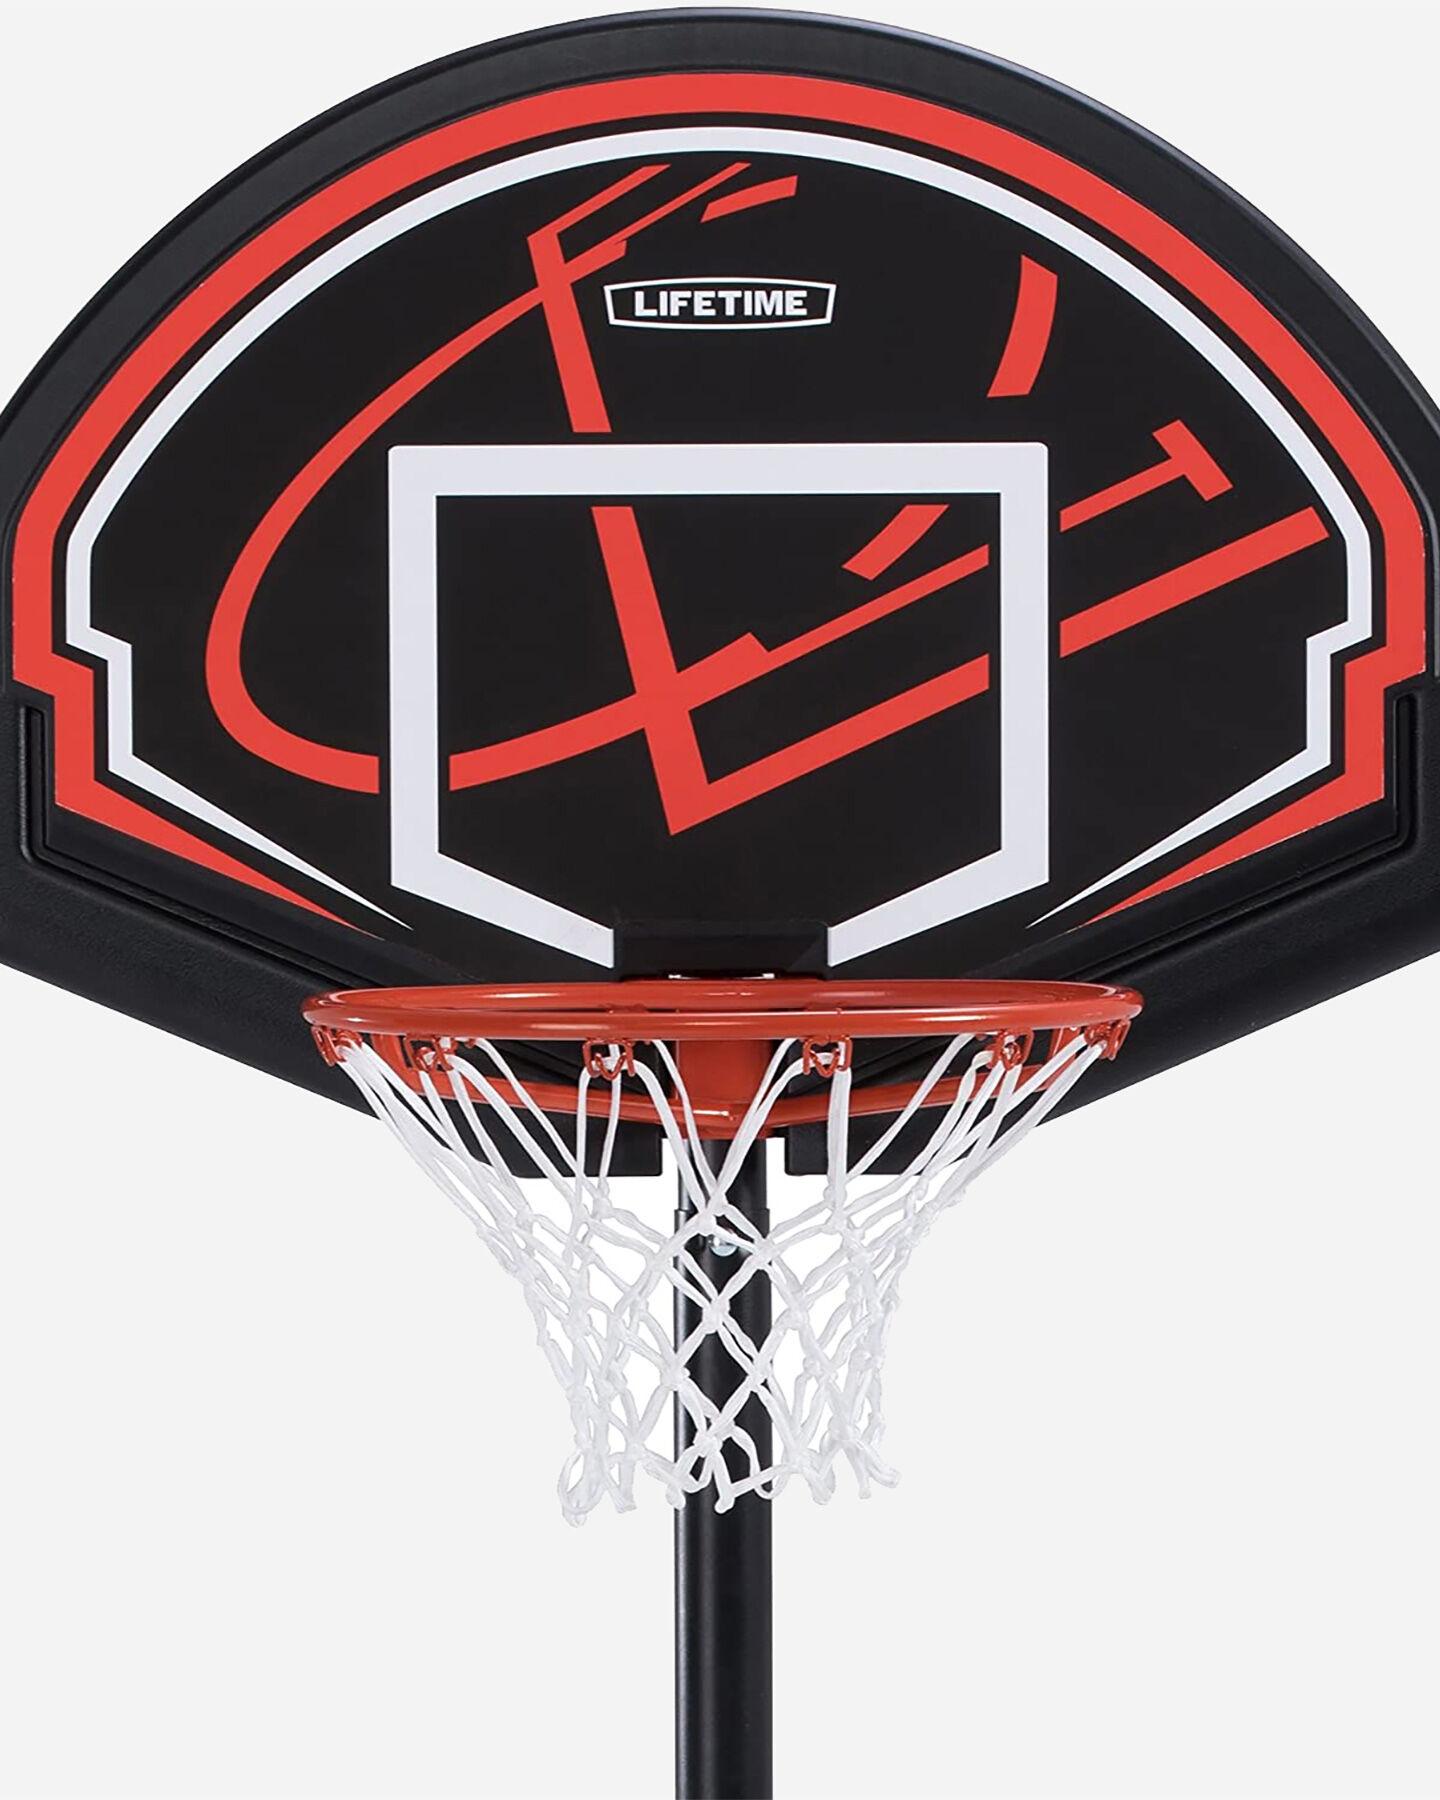 Attrezzatura basket LIFETIME IMPIANTO BASKET JR S2000549 896 - scatto 1